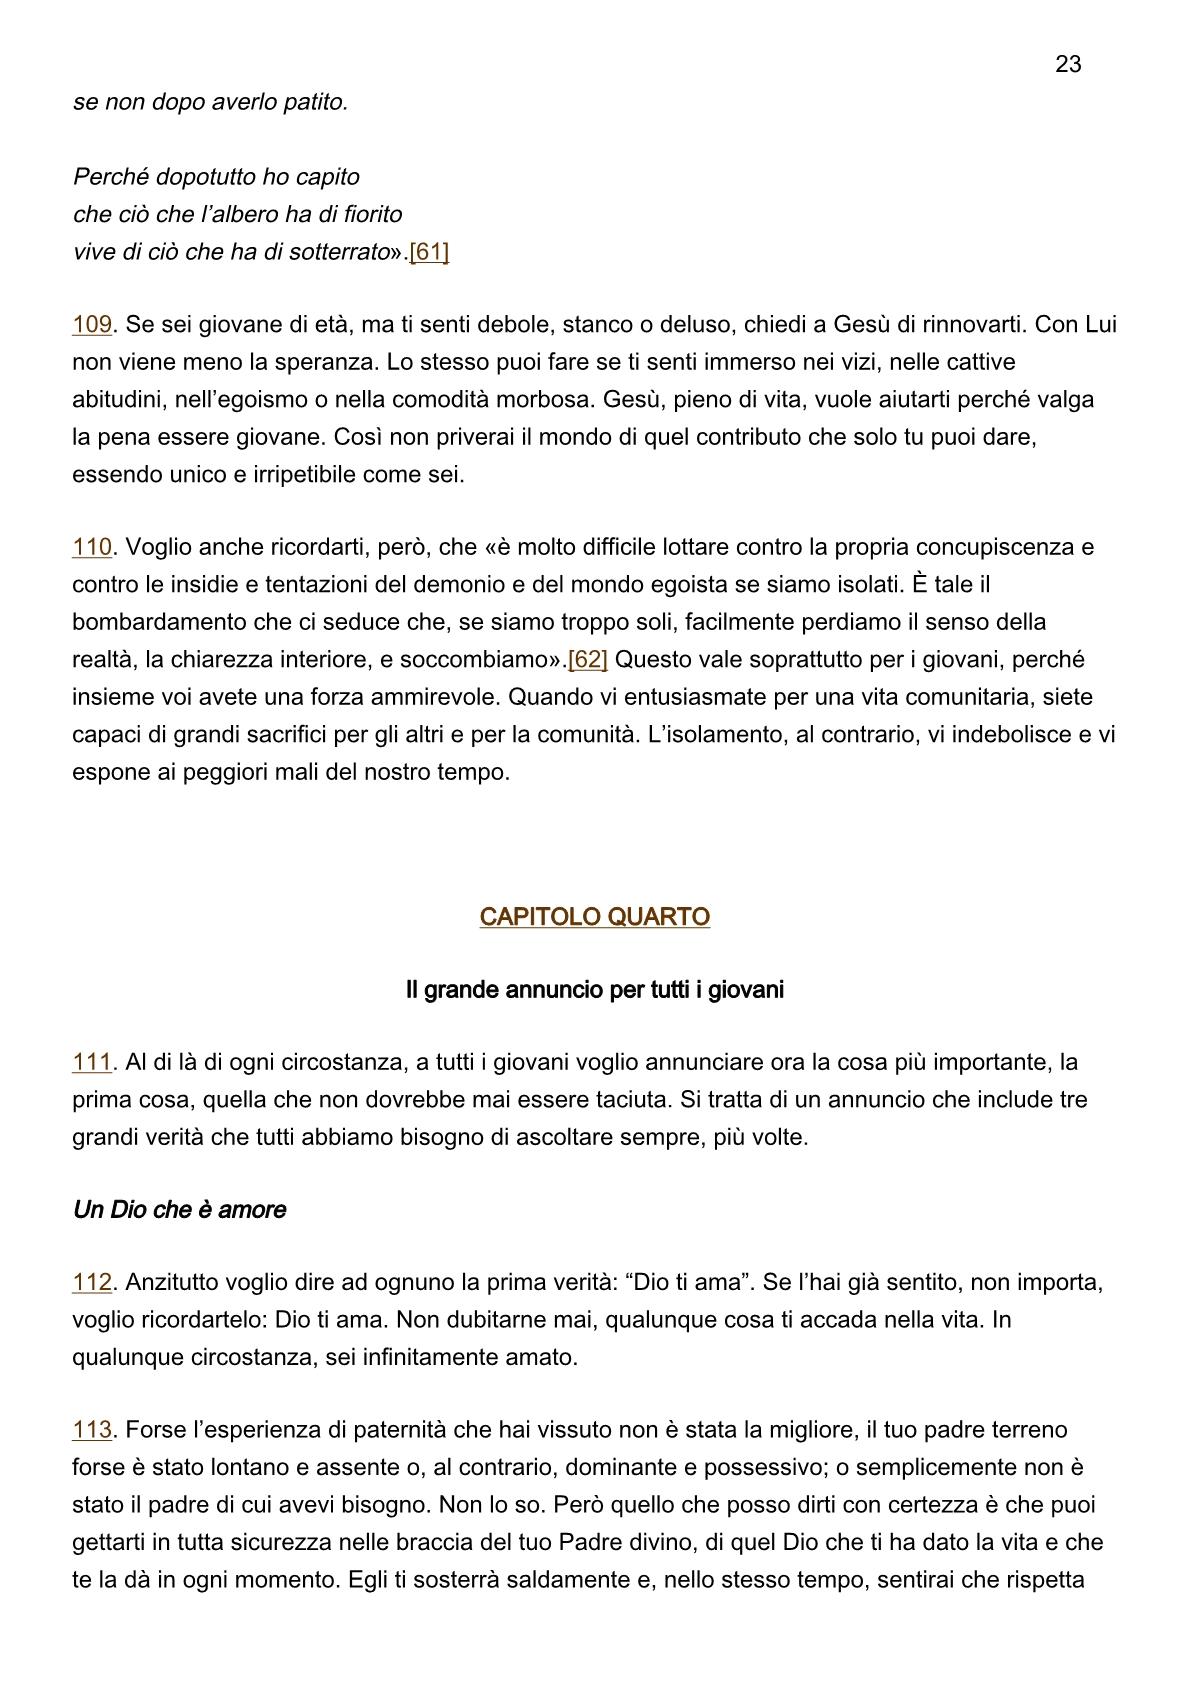 papa-francesco_esortazione-ap_20190325_christus-vivit23